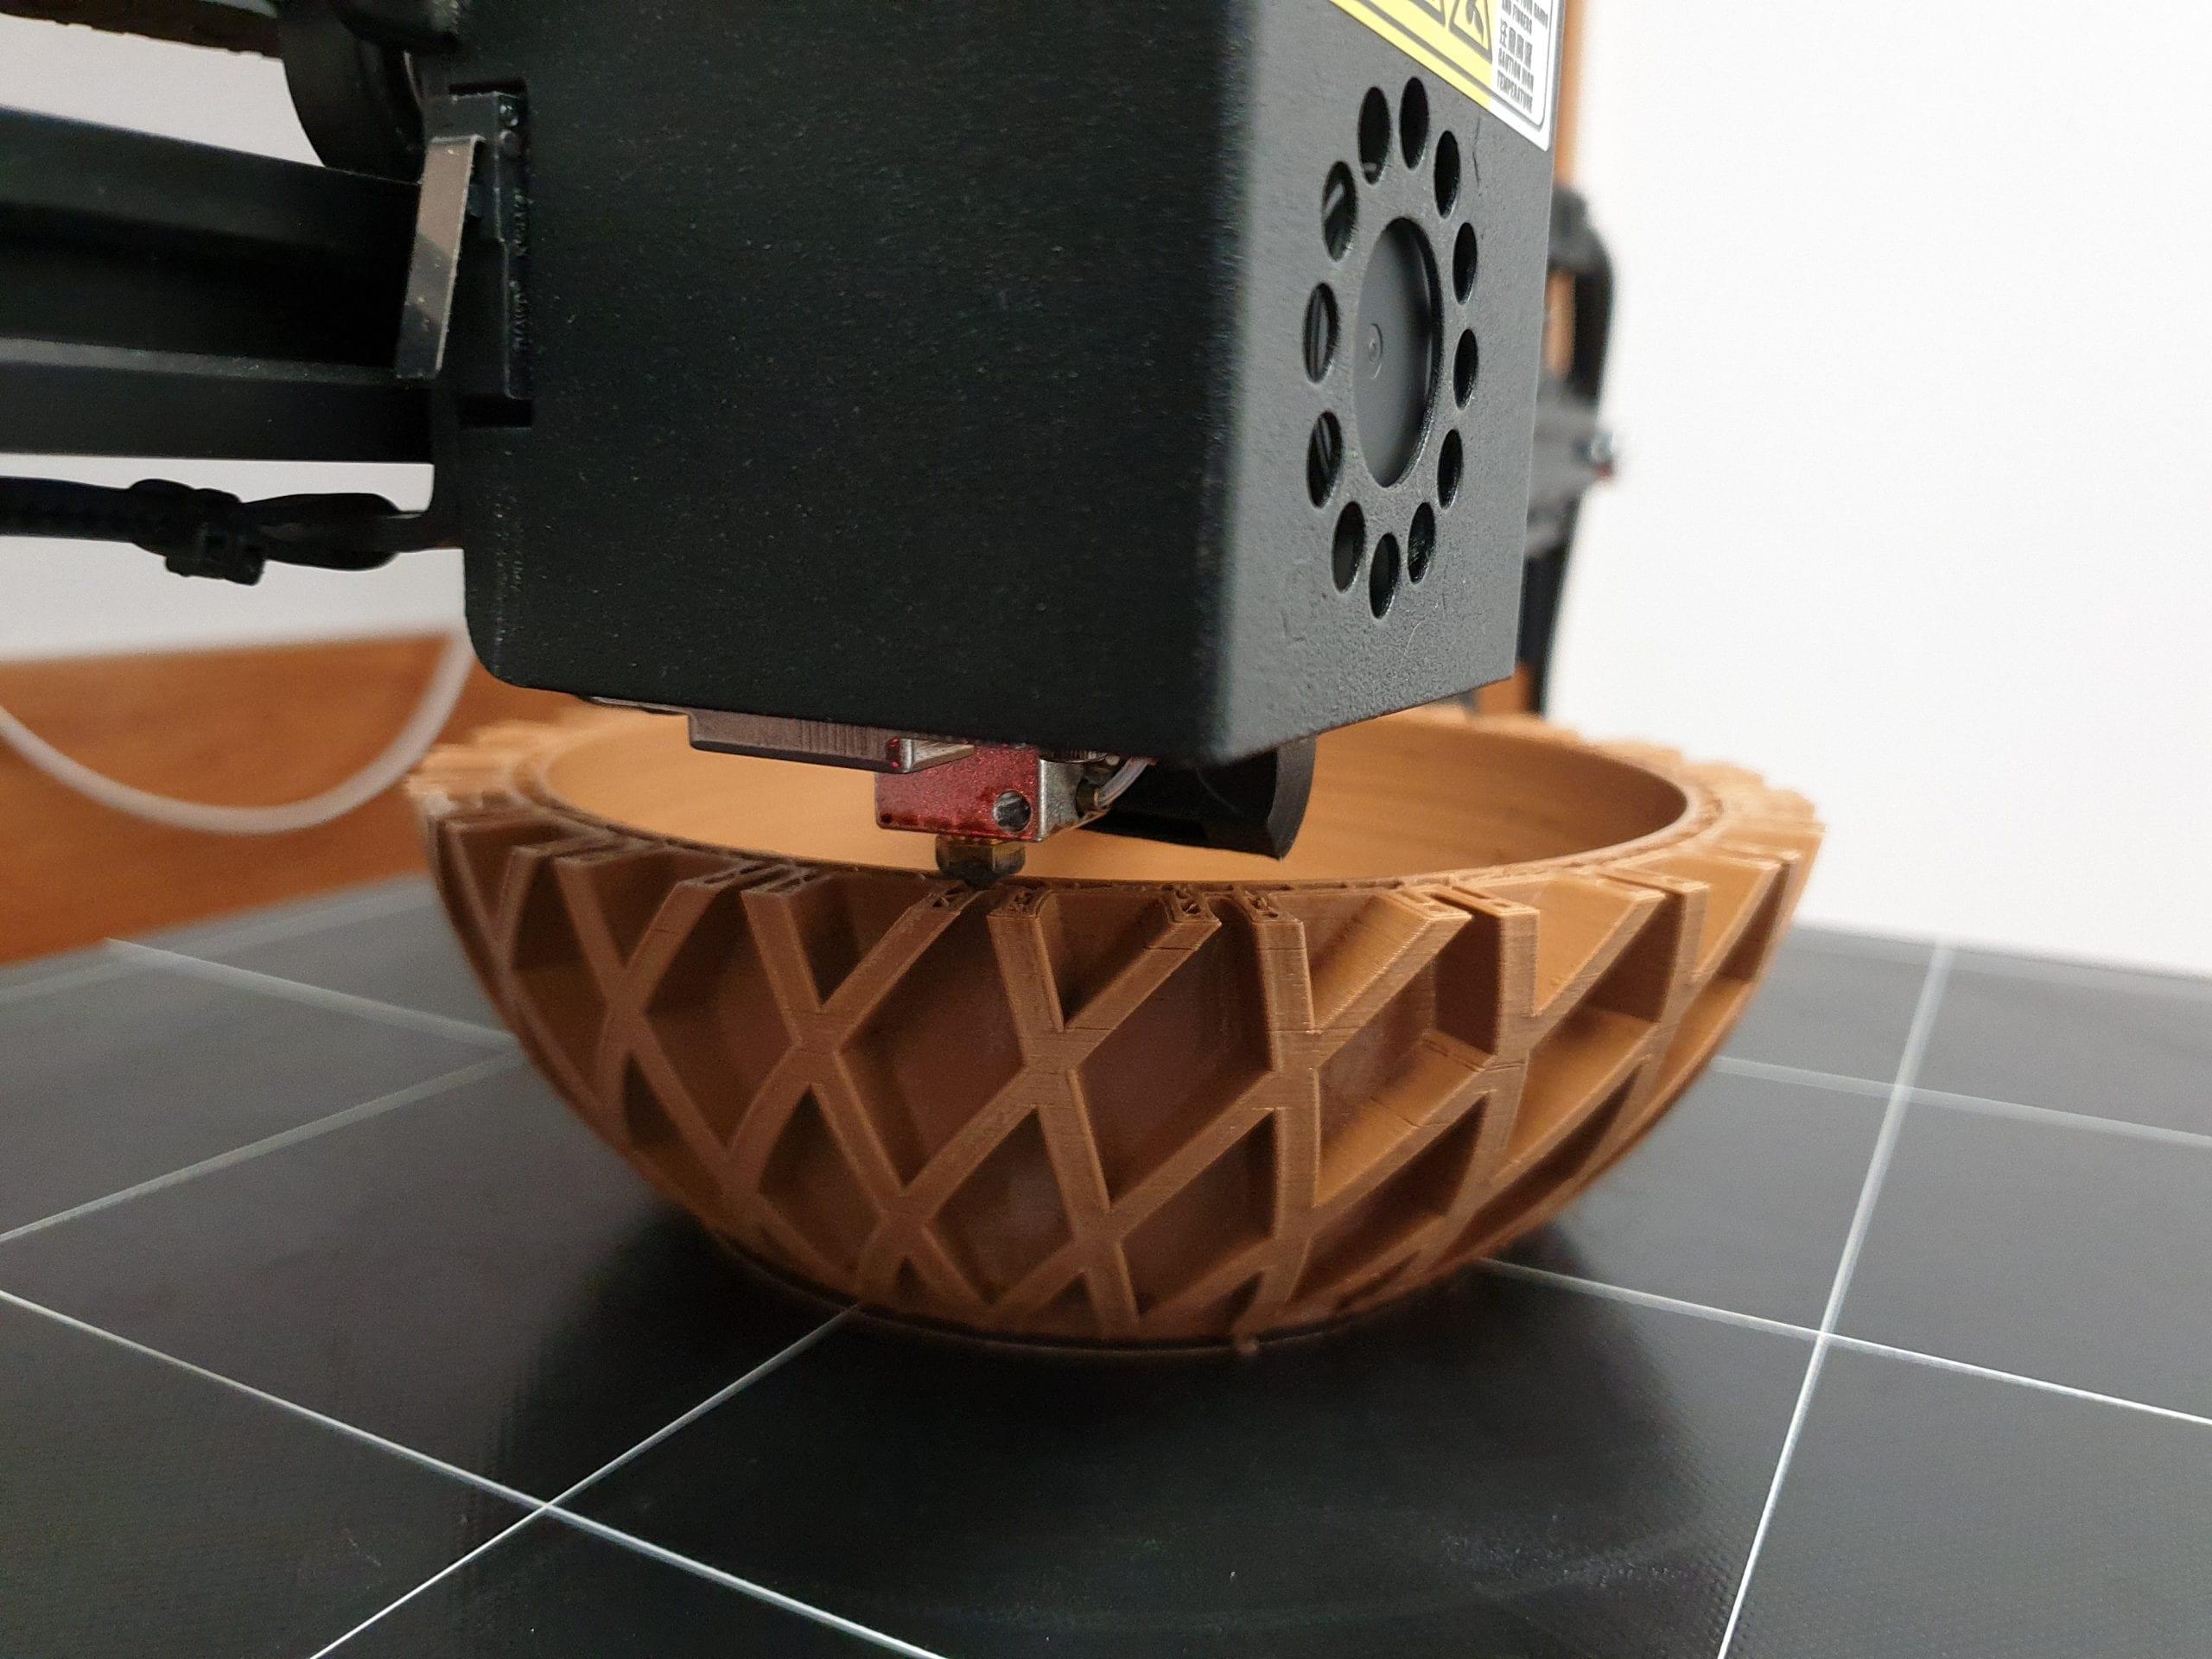 proceso de impresión 3d parte 2